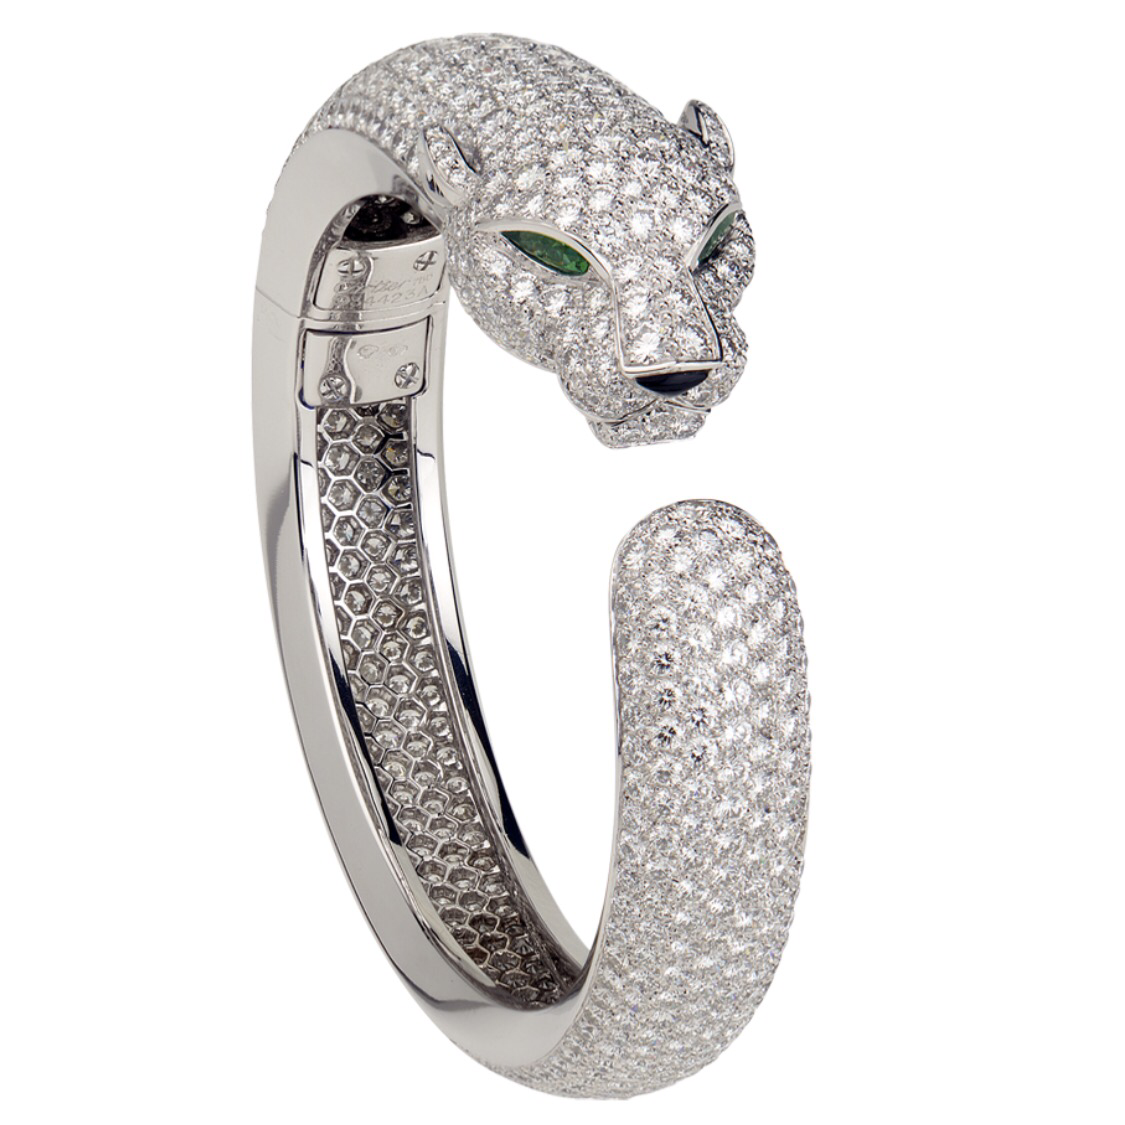 Panthere' de Cartier Bracelet For Lisa Christiansen